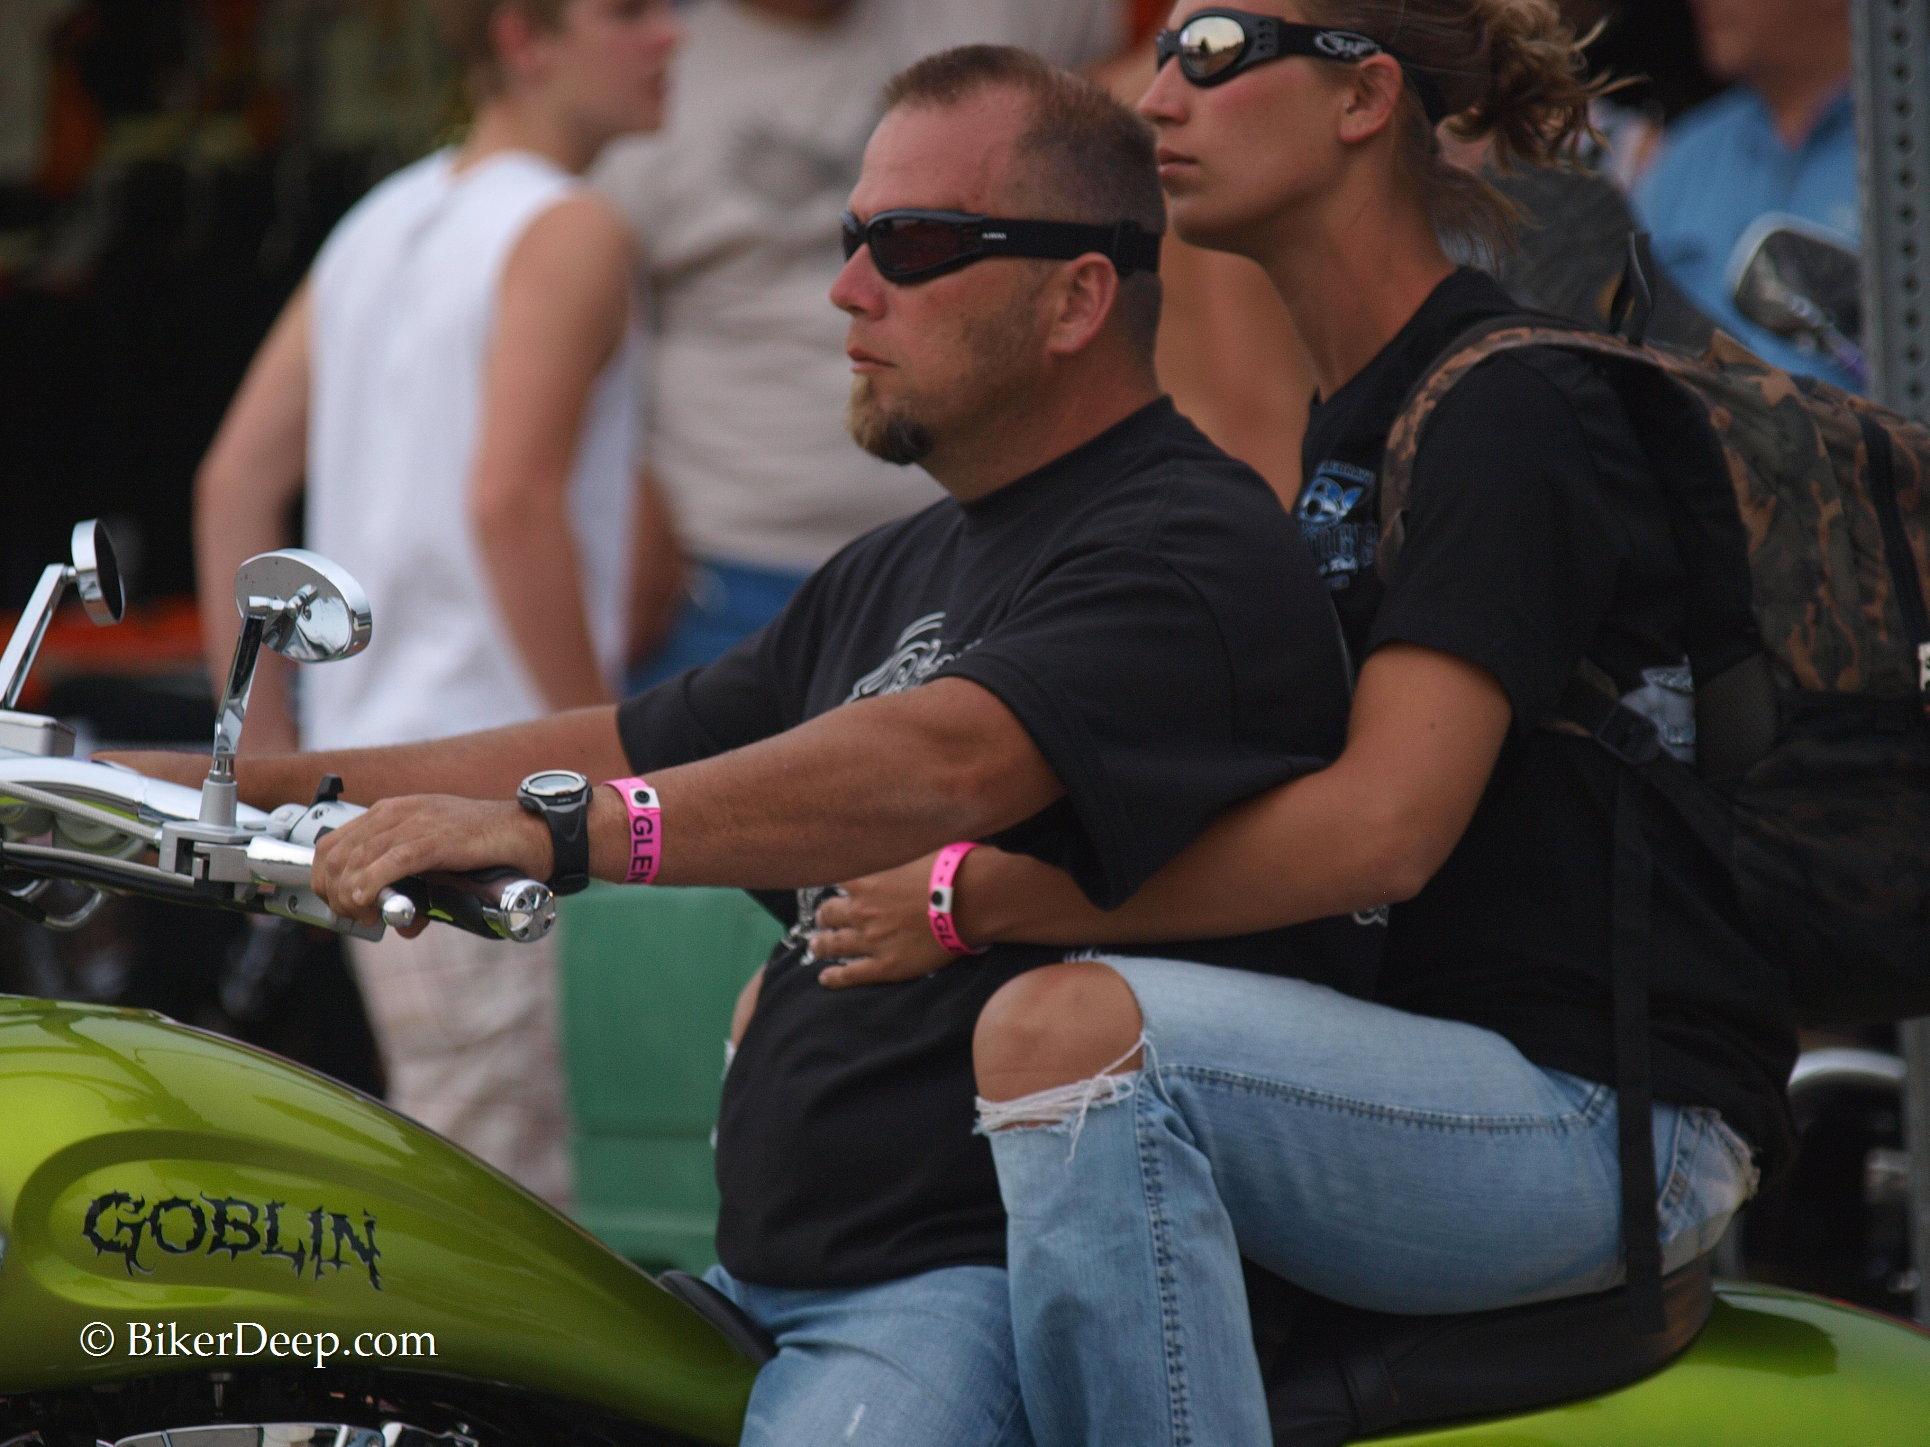 Goblin Motorcycle